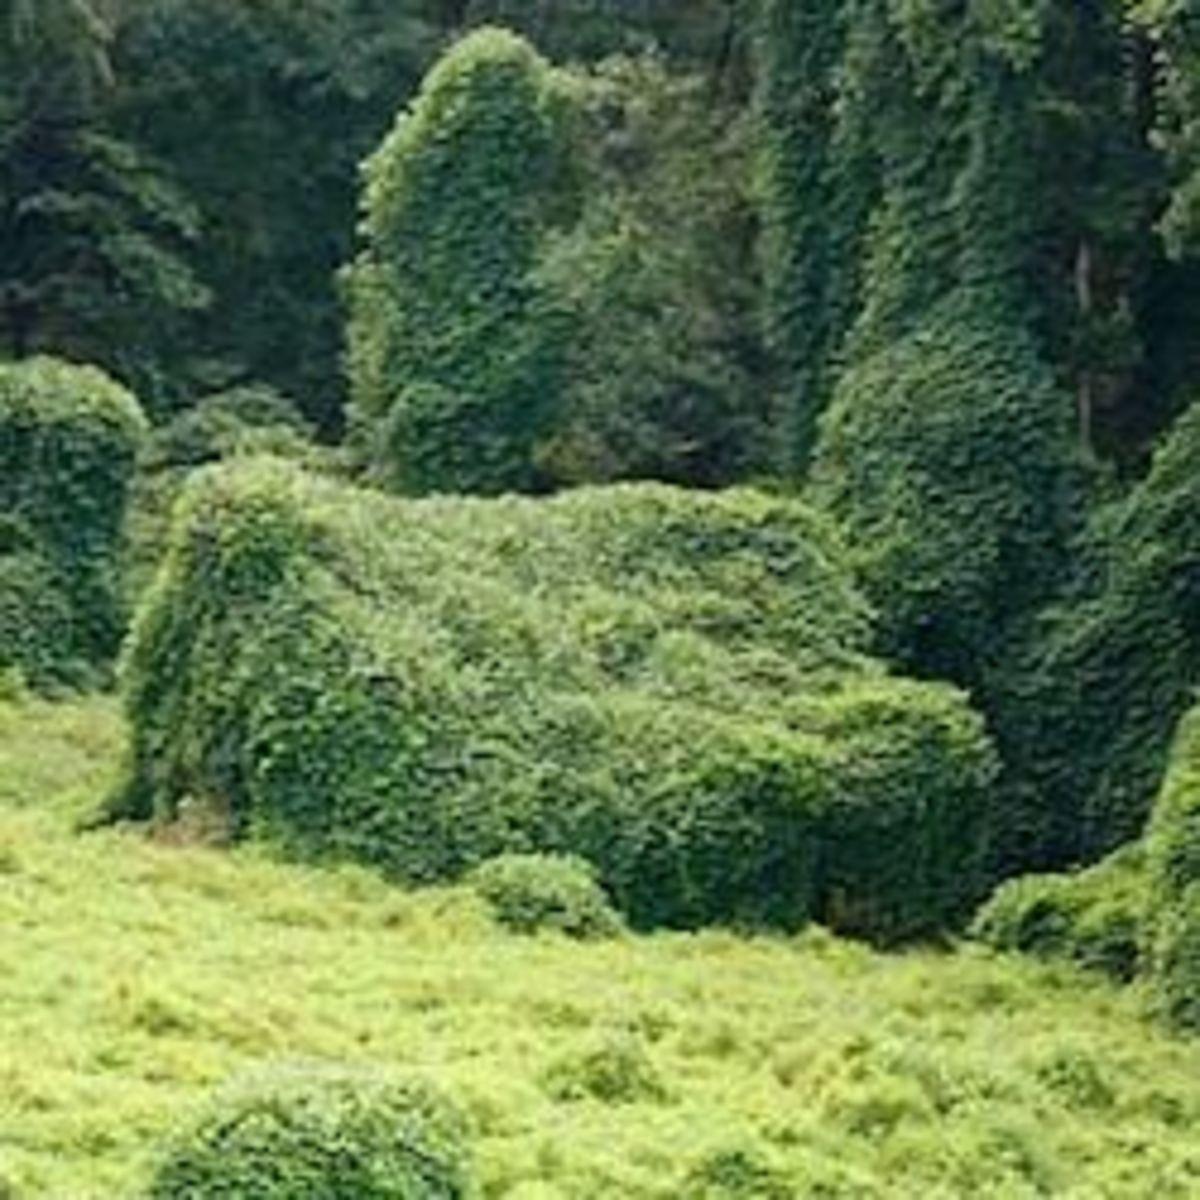 Kudzu: The vine that ate the south